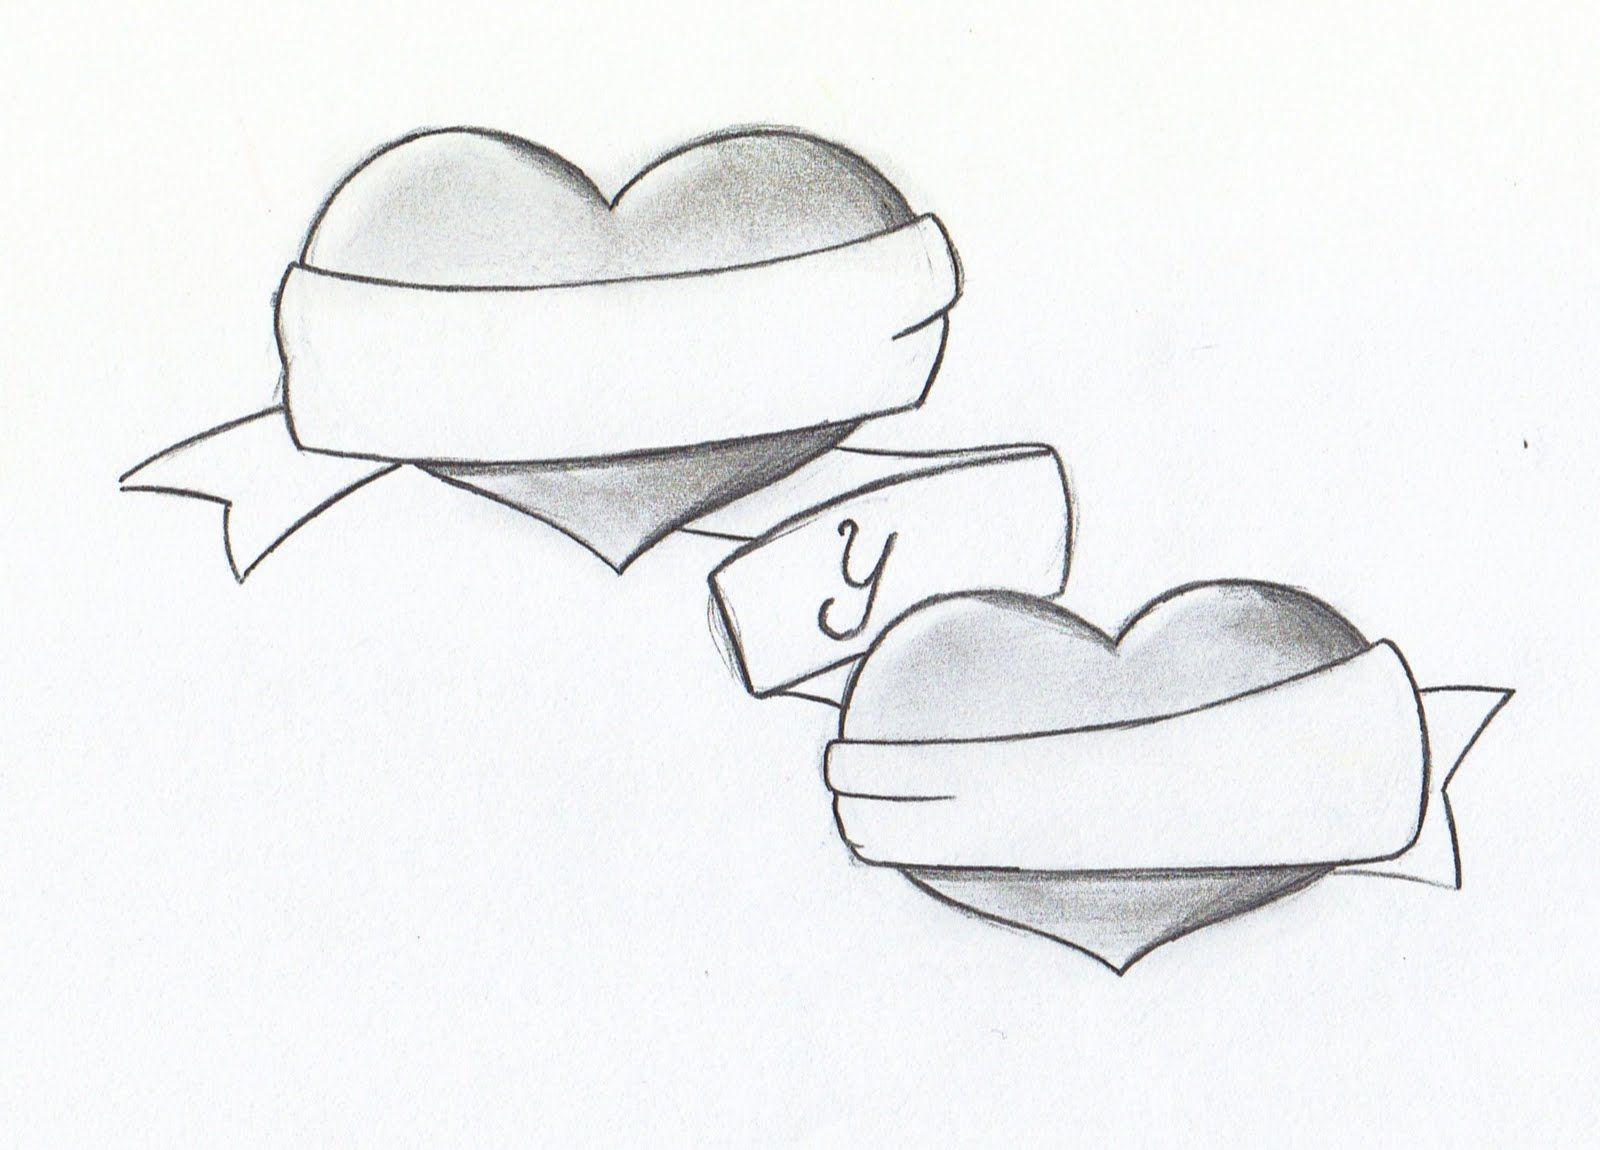 Dibujos Para Amor Wallpaper Gratis 5 Hd Wallpapers Con Imagenes